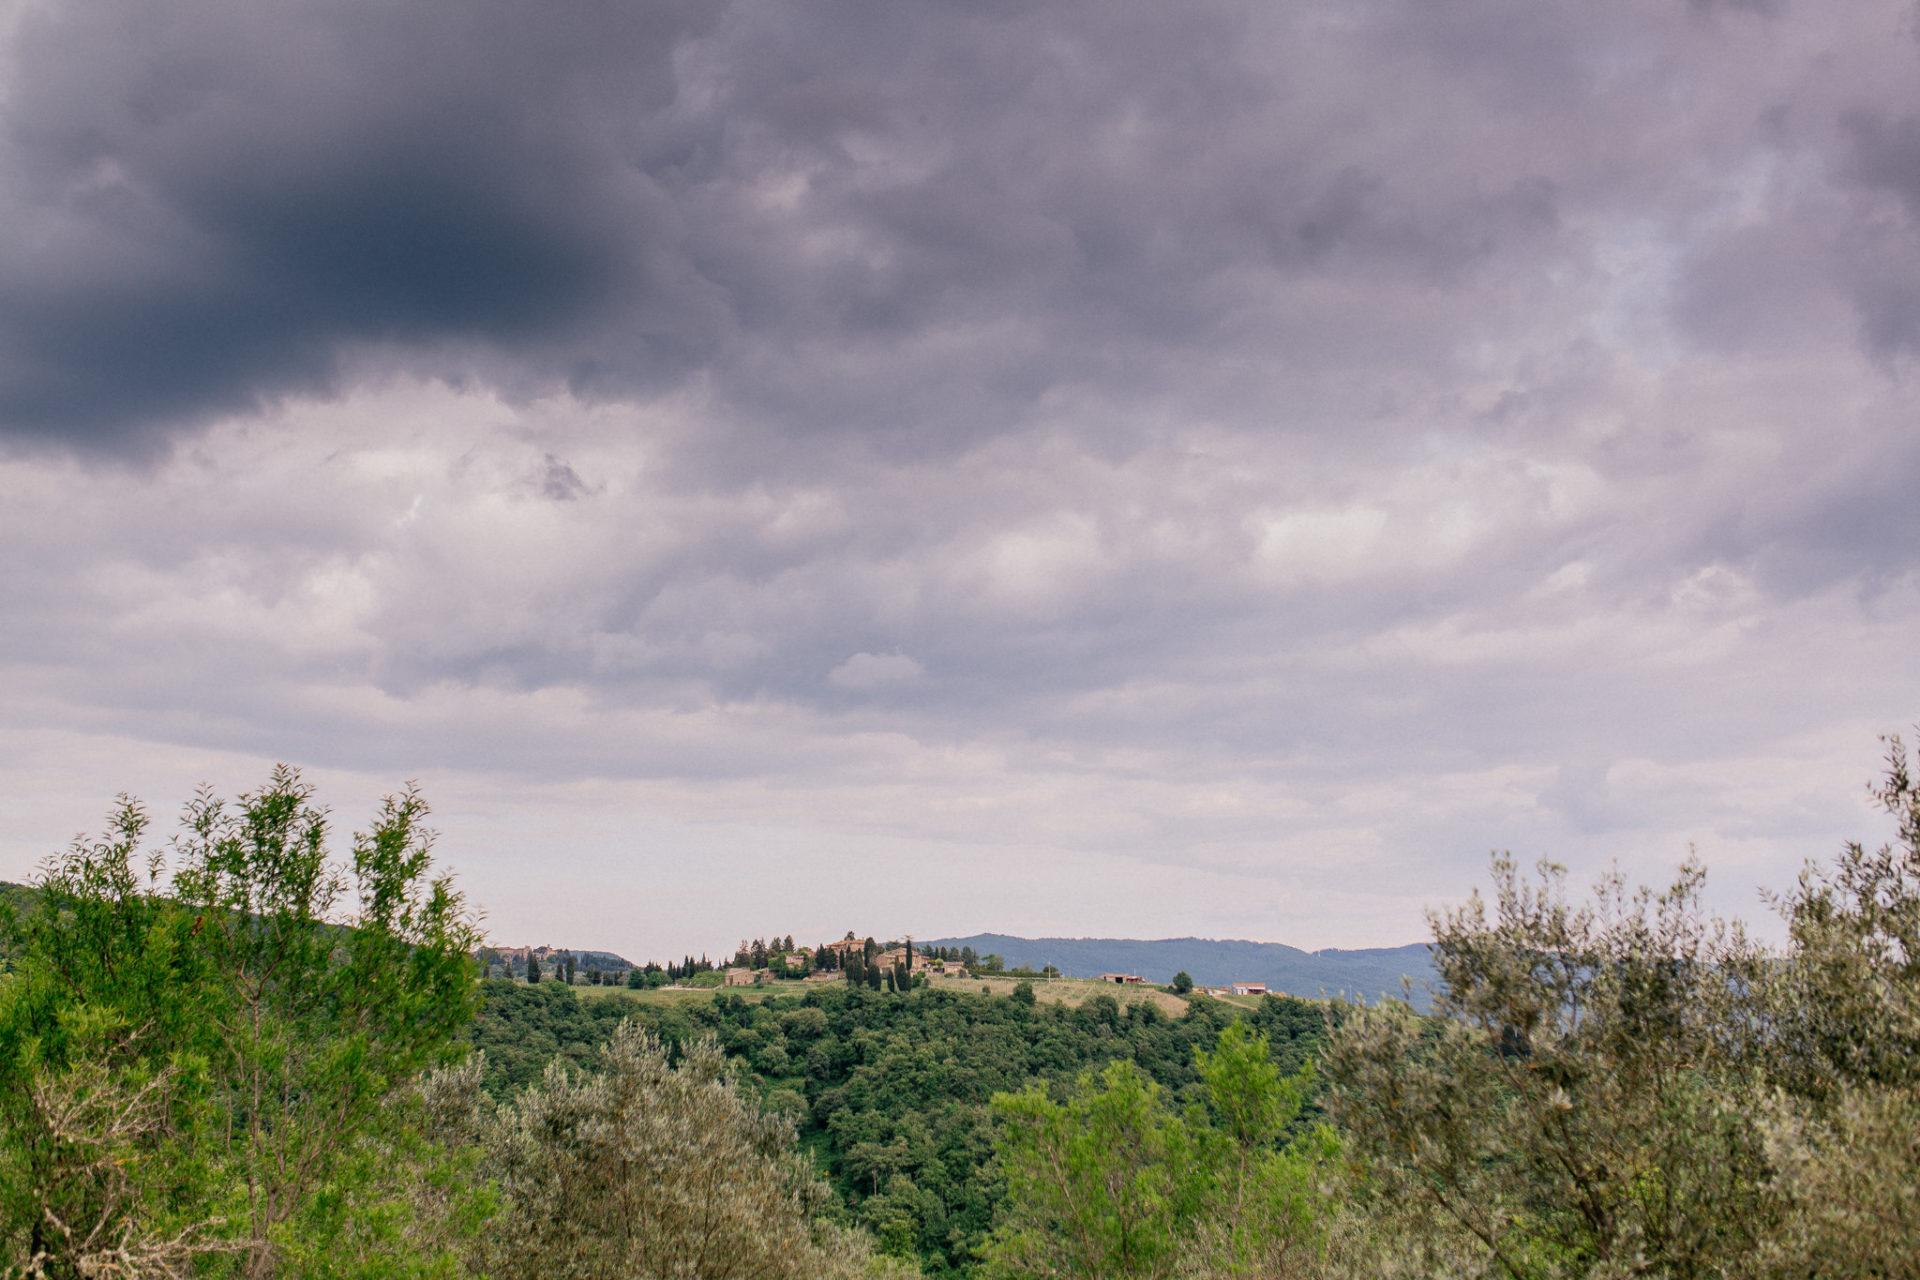 wedding photographer tuscany-italy road trip with dog-chianti region wineries hiking-organic vineyard